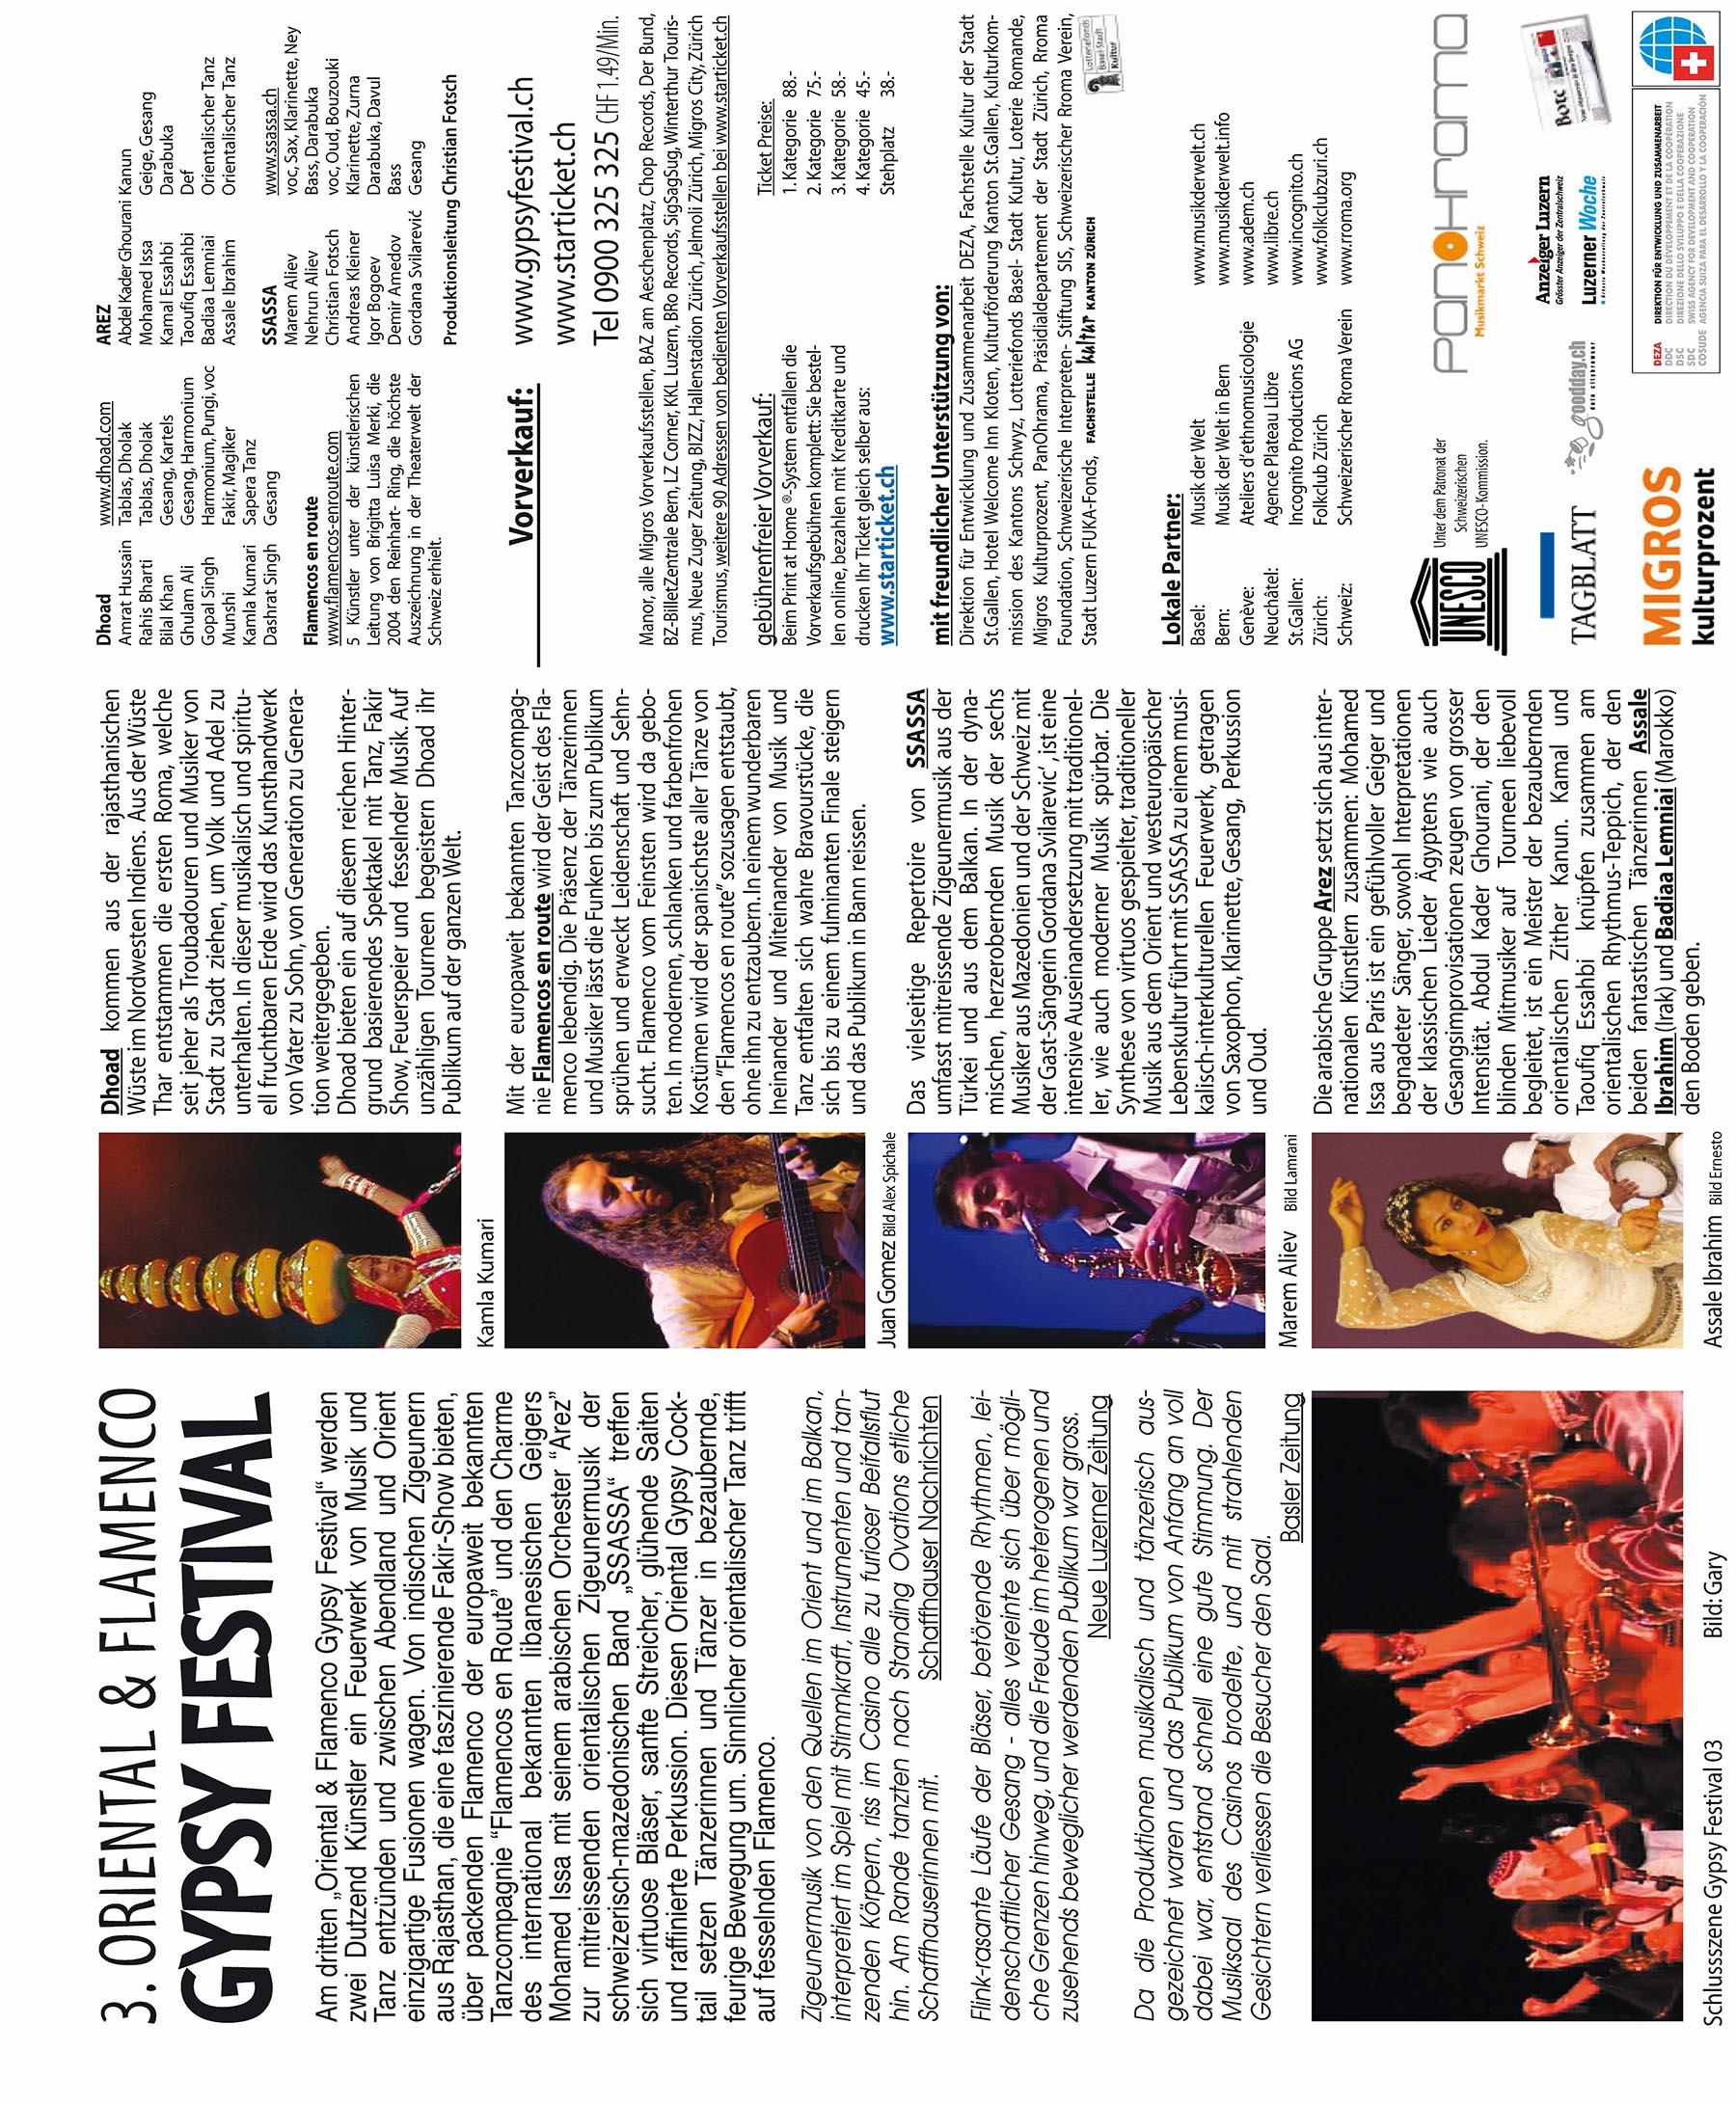 Gypsyfestival Flyer 2005_2